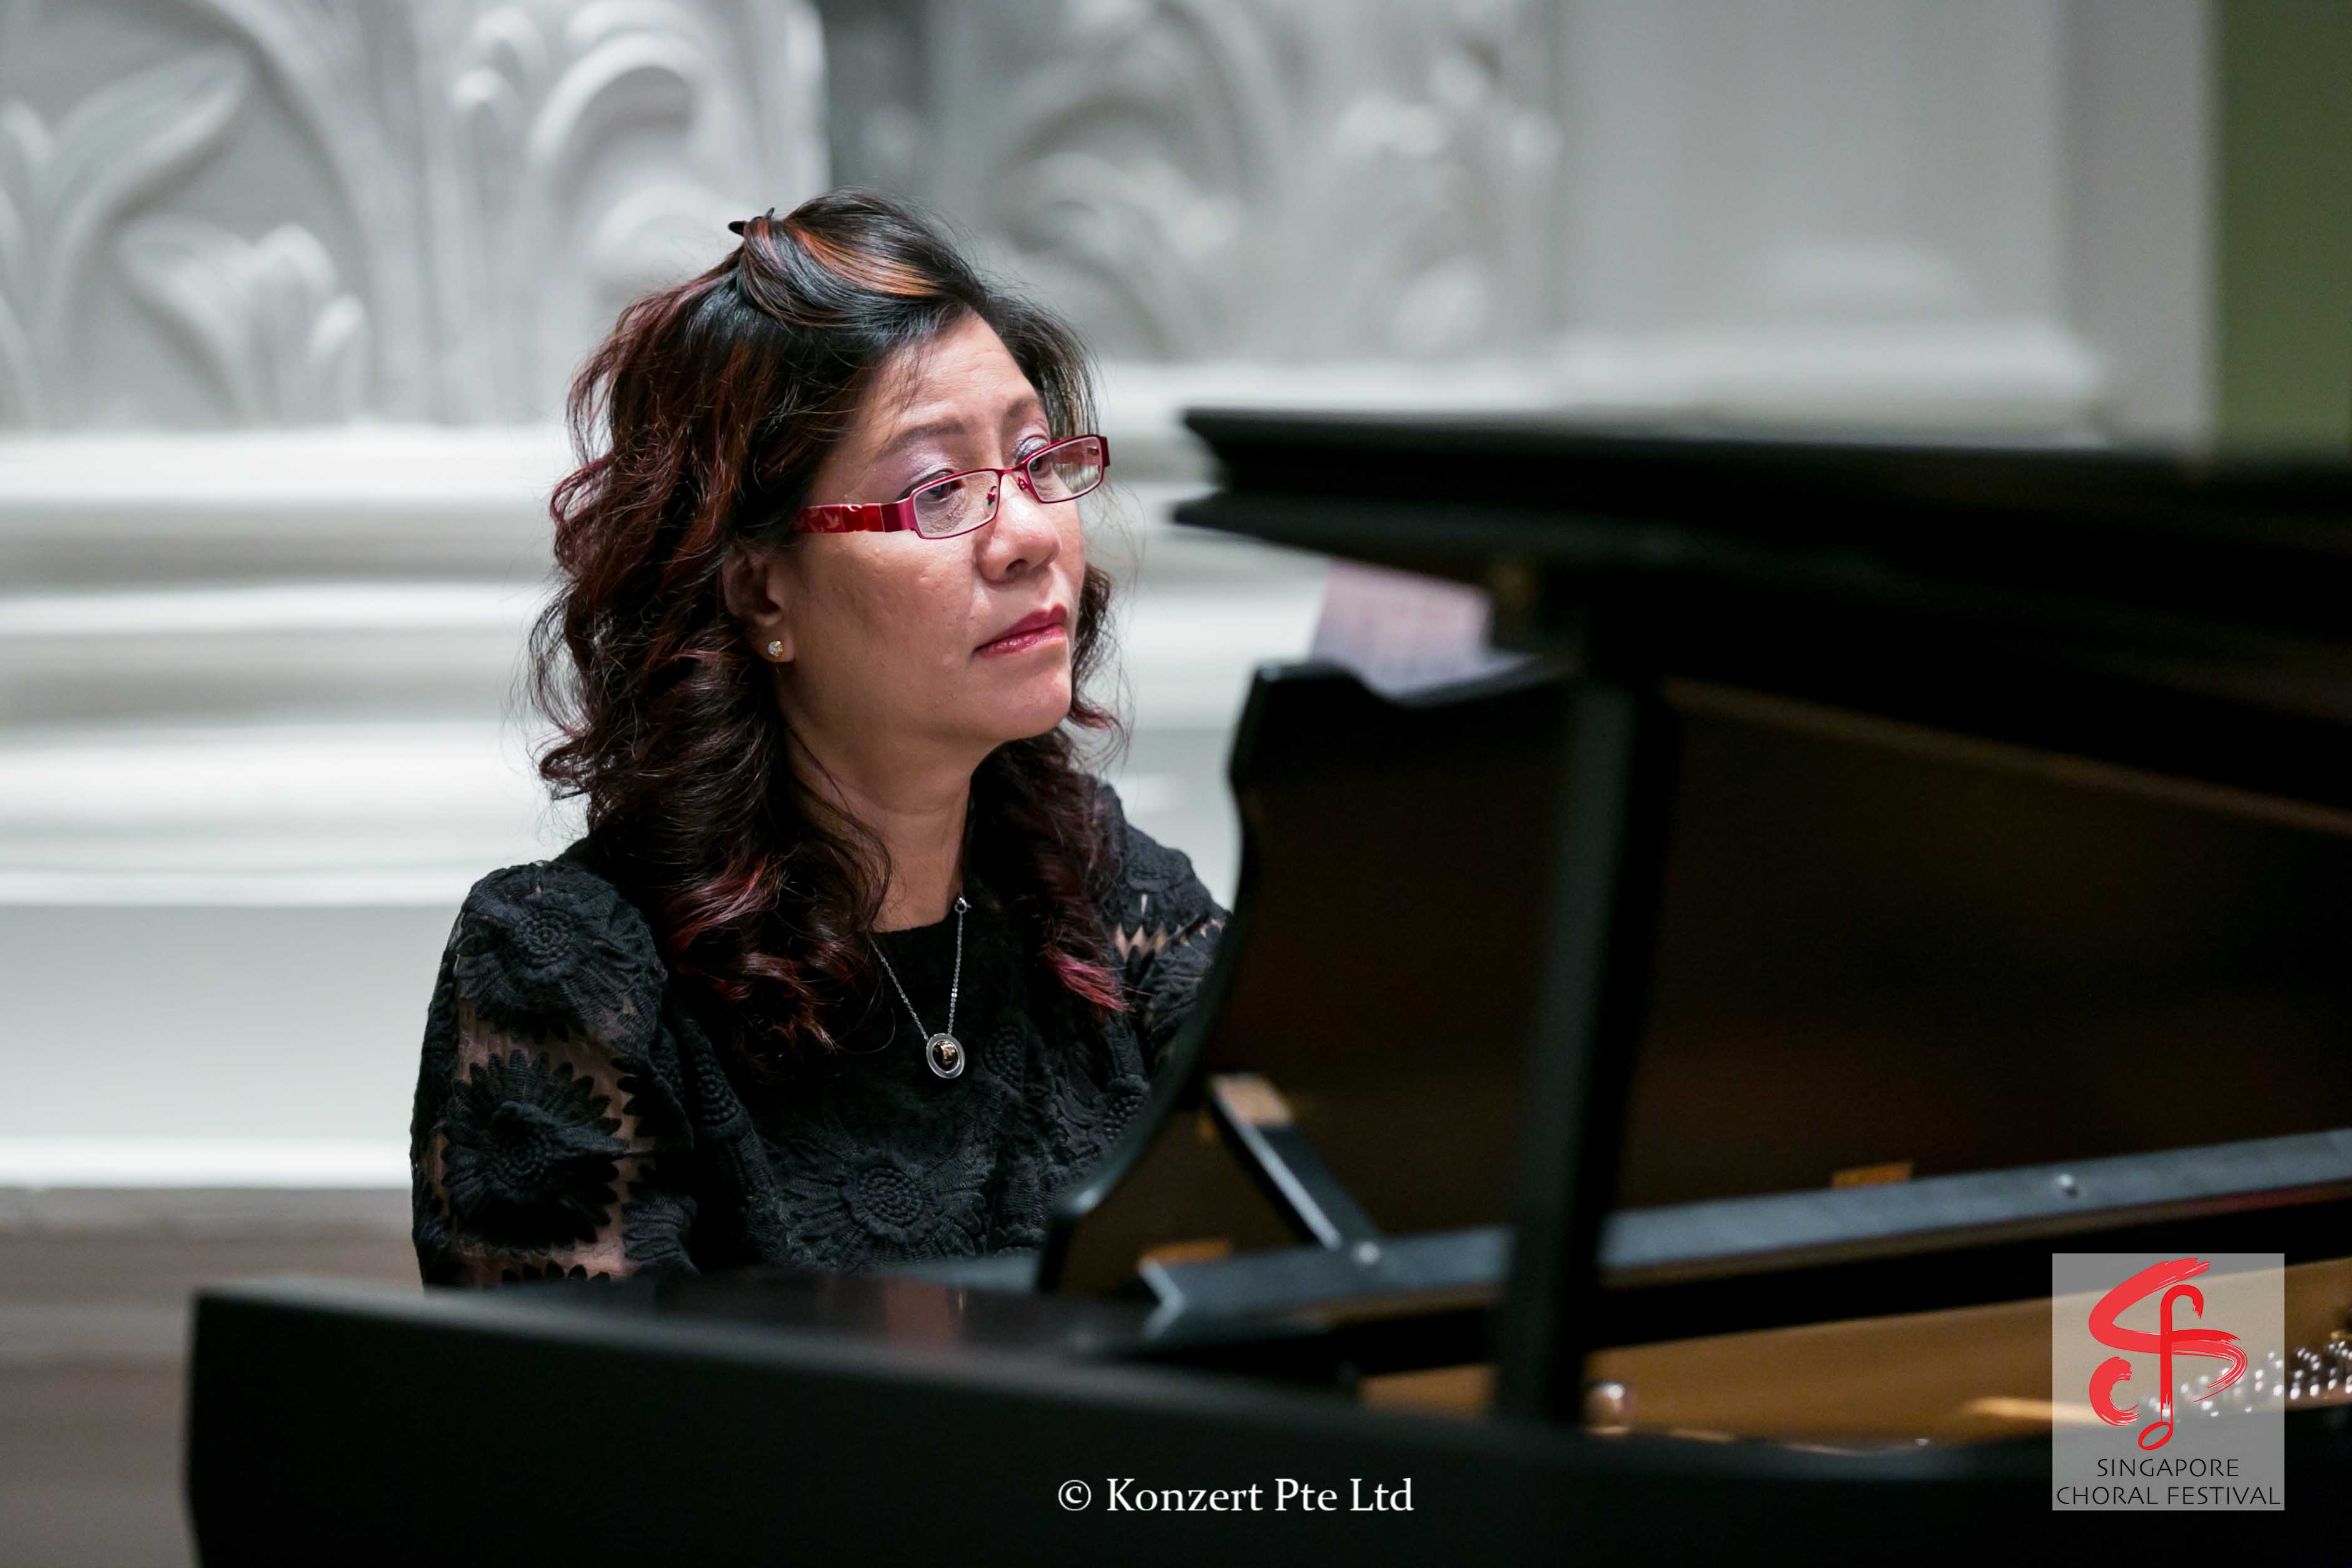 Singapore Choral Festival 7-8-15 (49).jpg